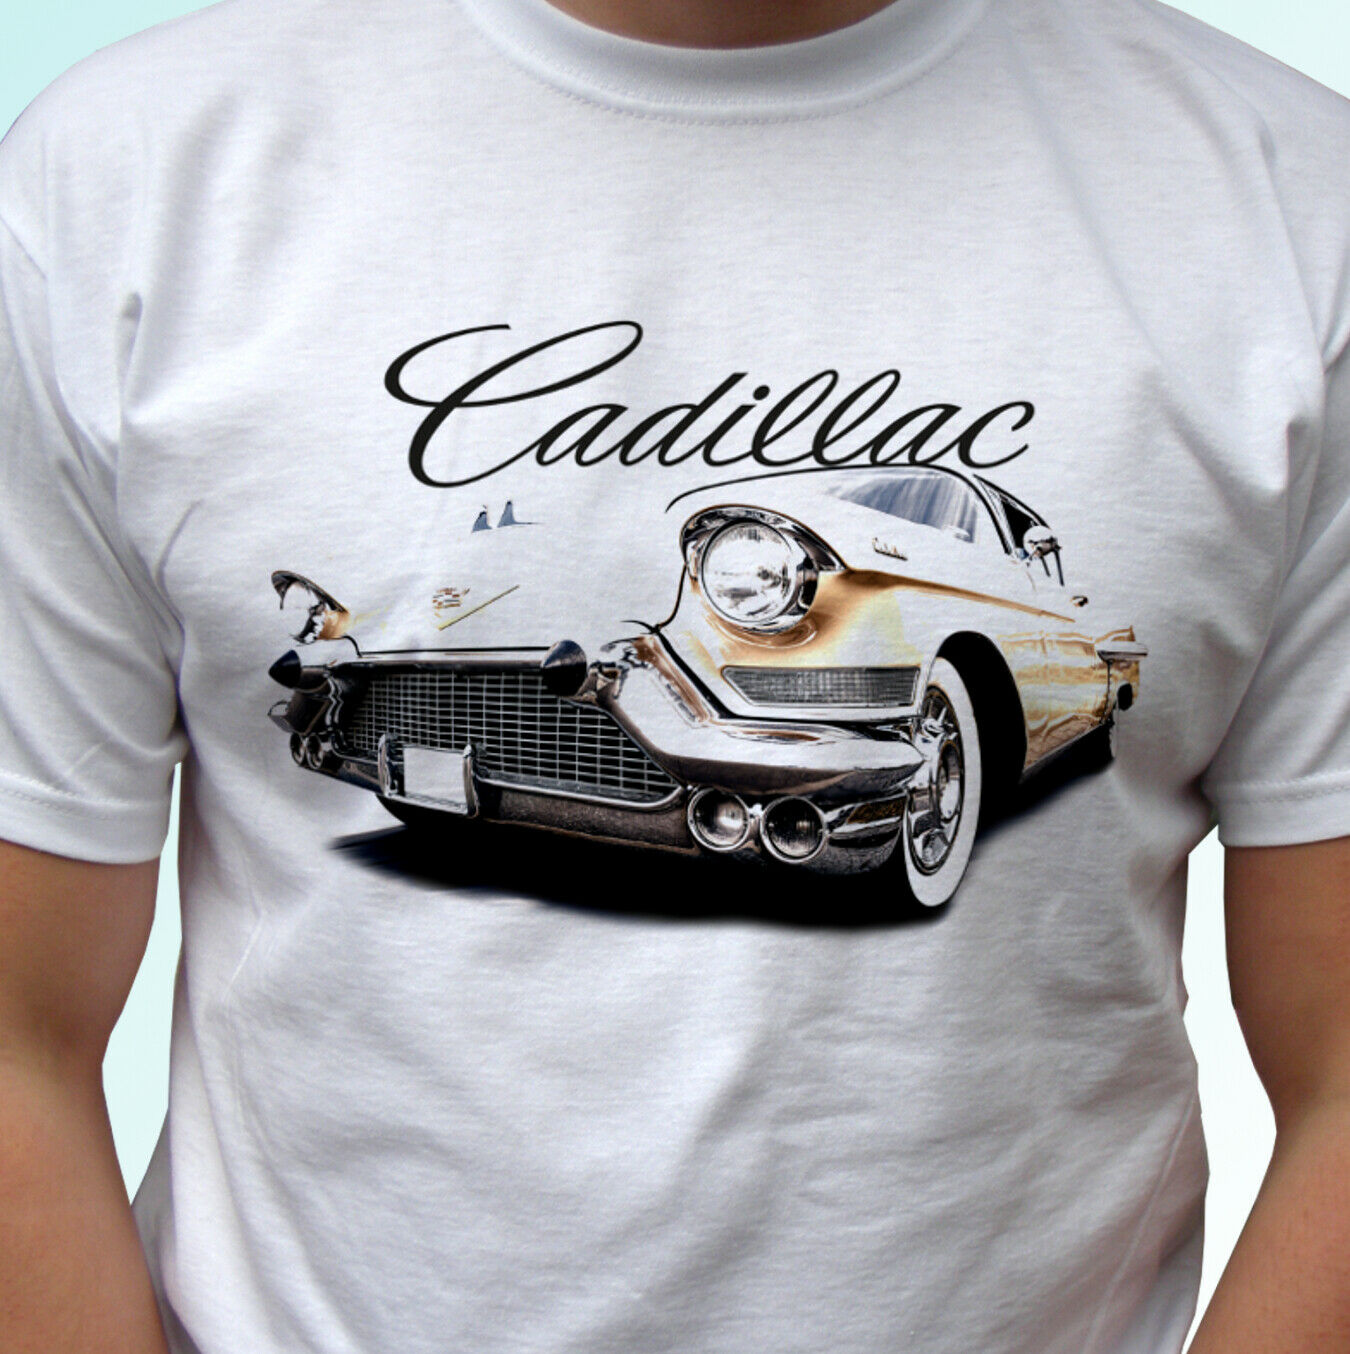 Lexus Tshirt Fashion Cotton Men T-Shirt Tee Top Women Unisex Gift Car Fen Cloth